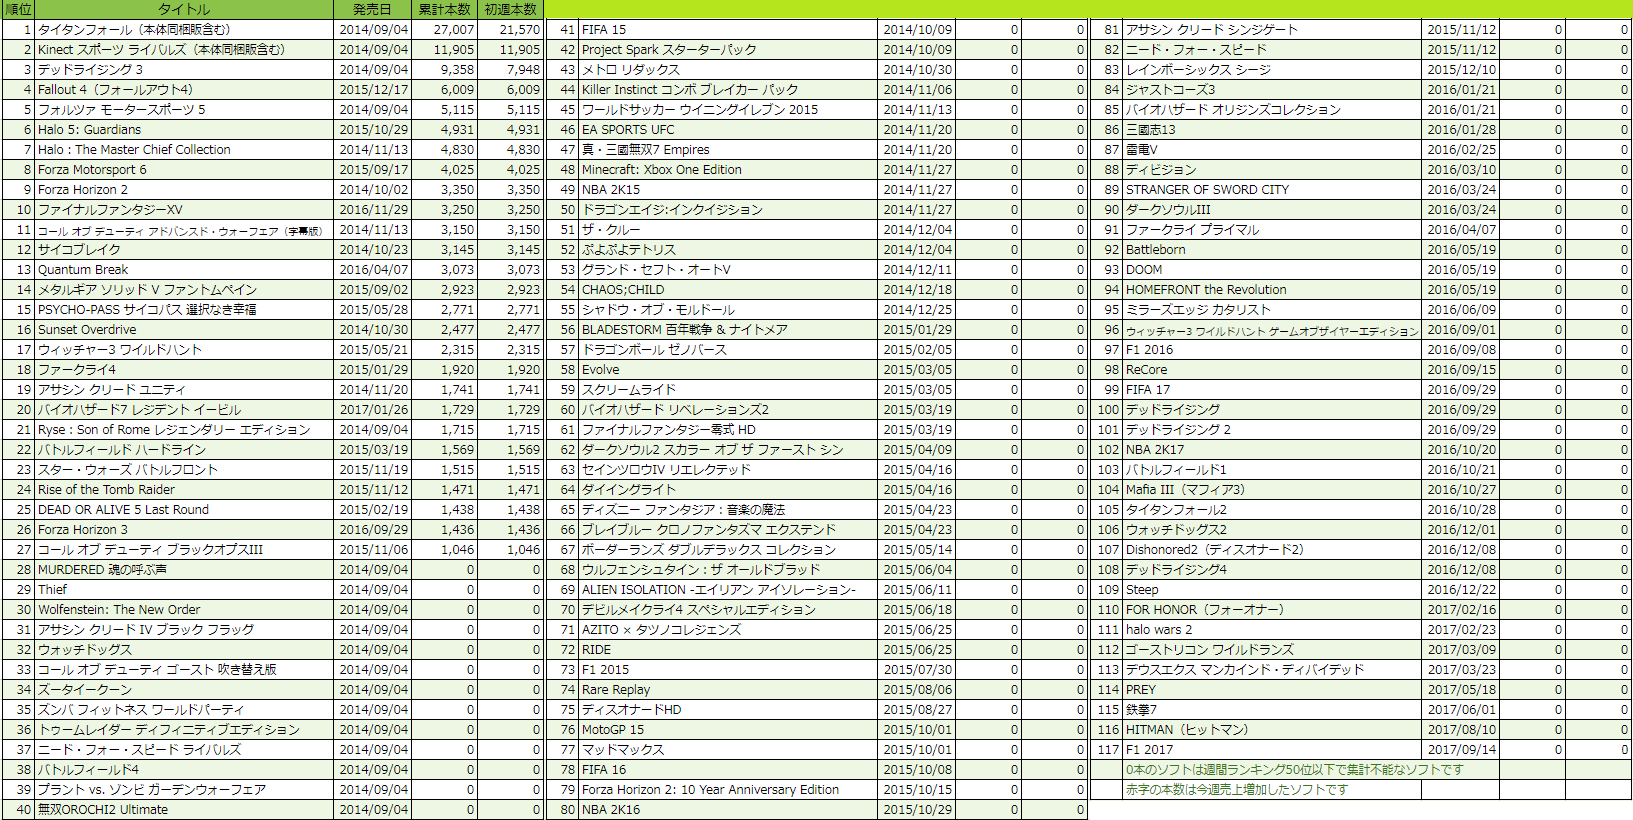 f6CIkP9zUk8zy - 【悲報】シティーズスカイライン 版元の意向により国内パッケ版はPS4版のみ販売へ変更